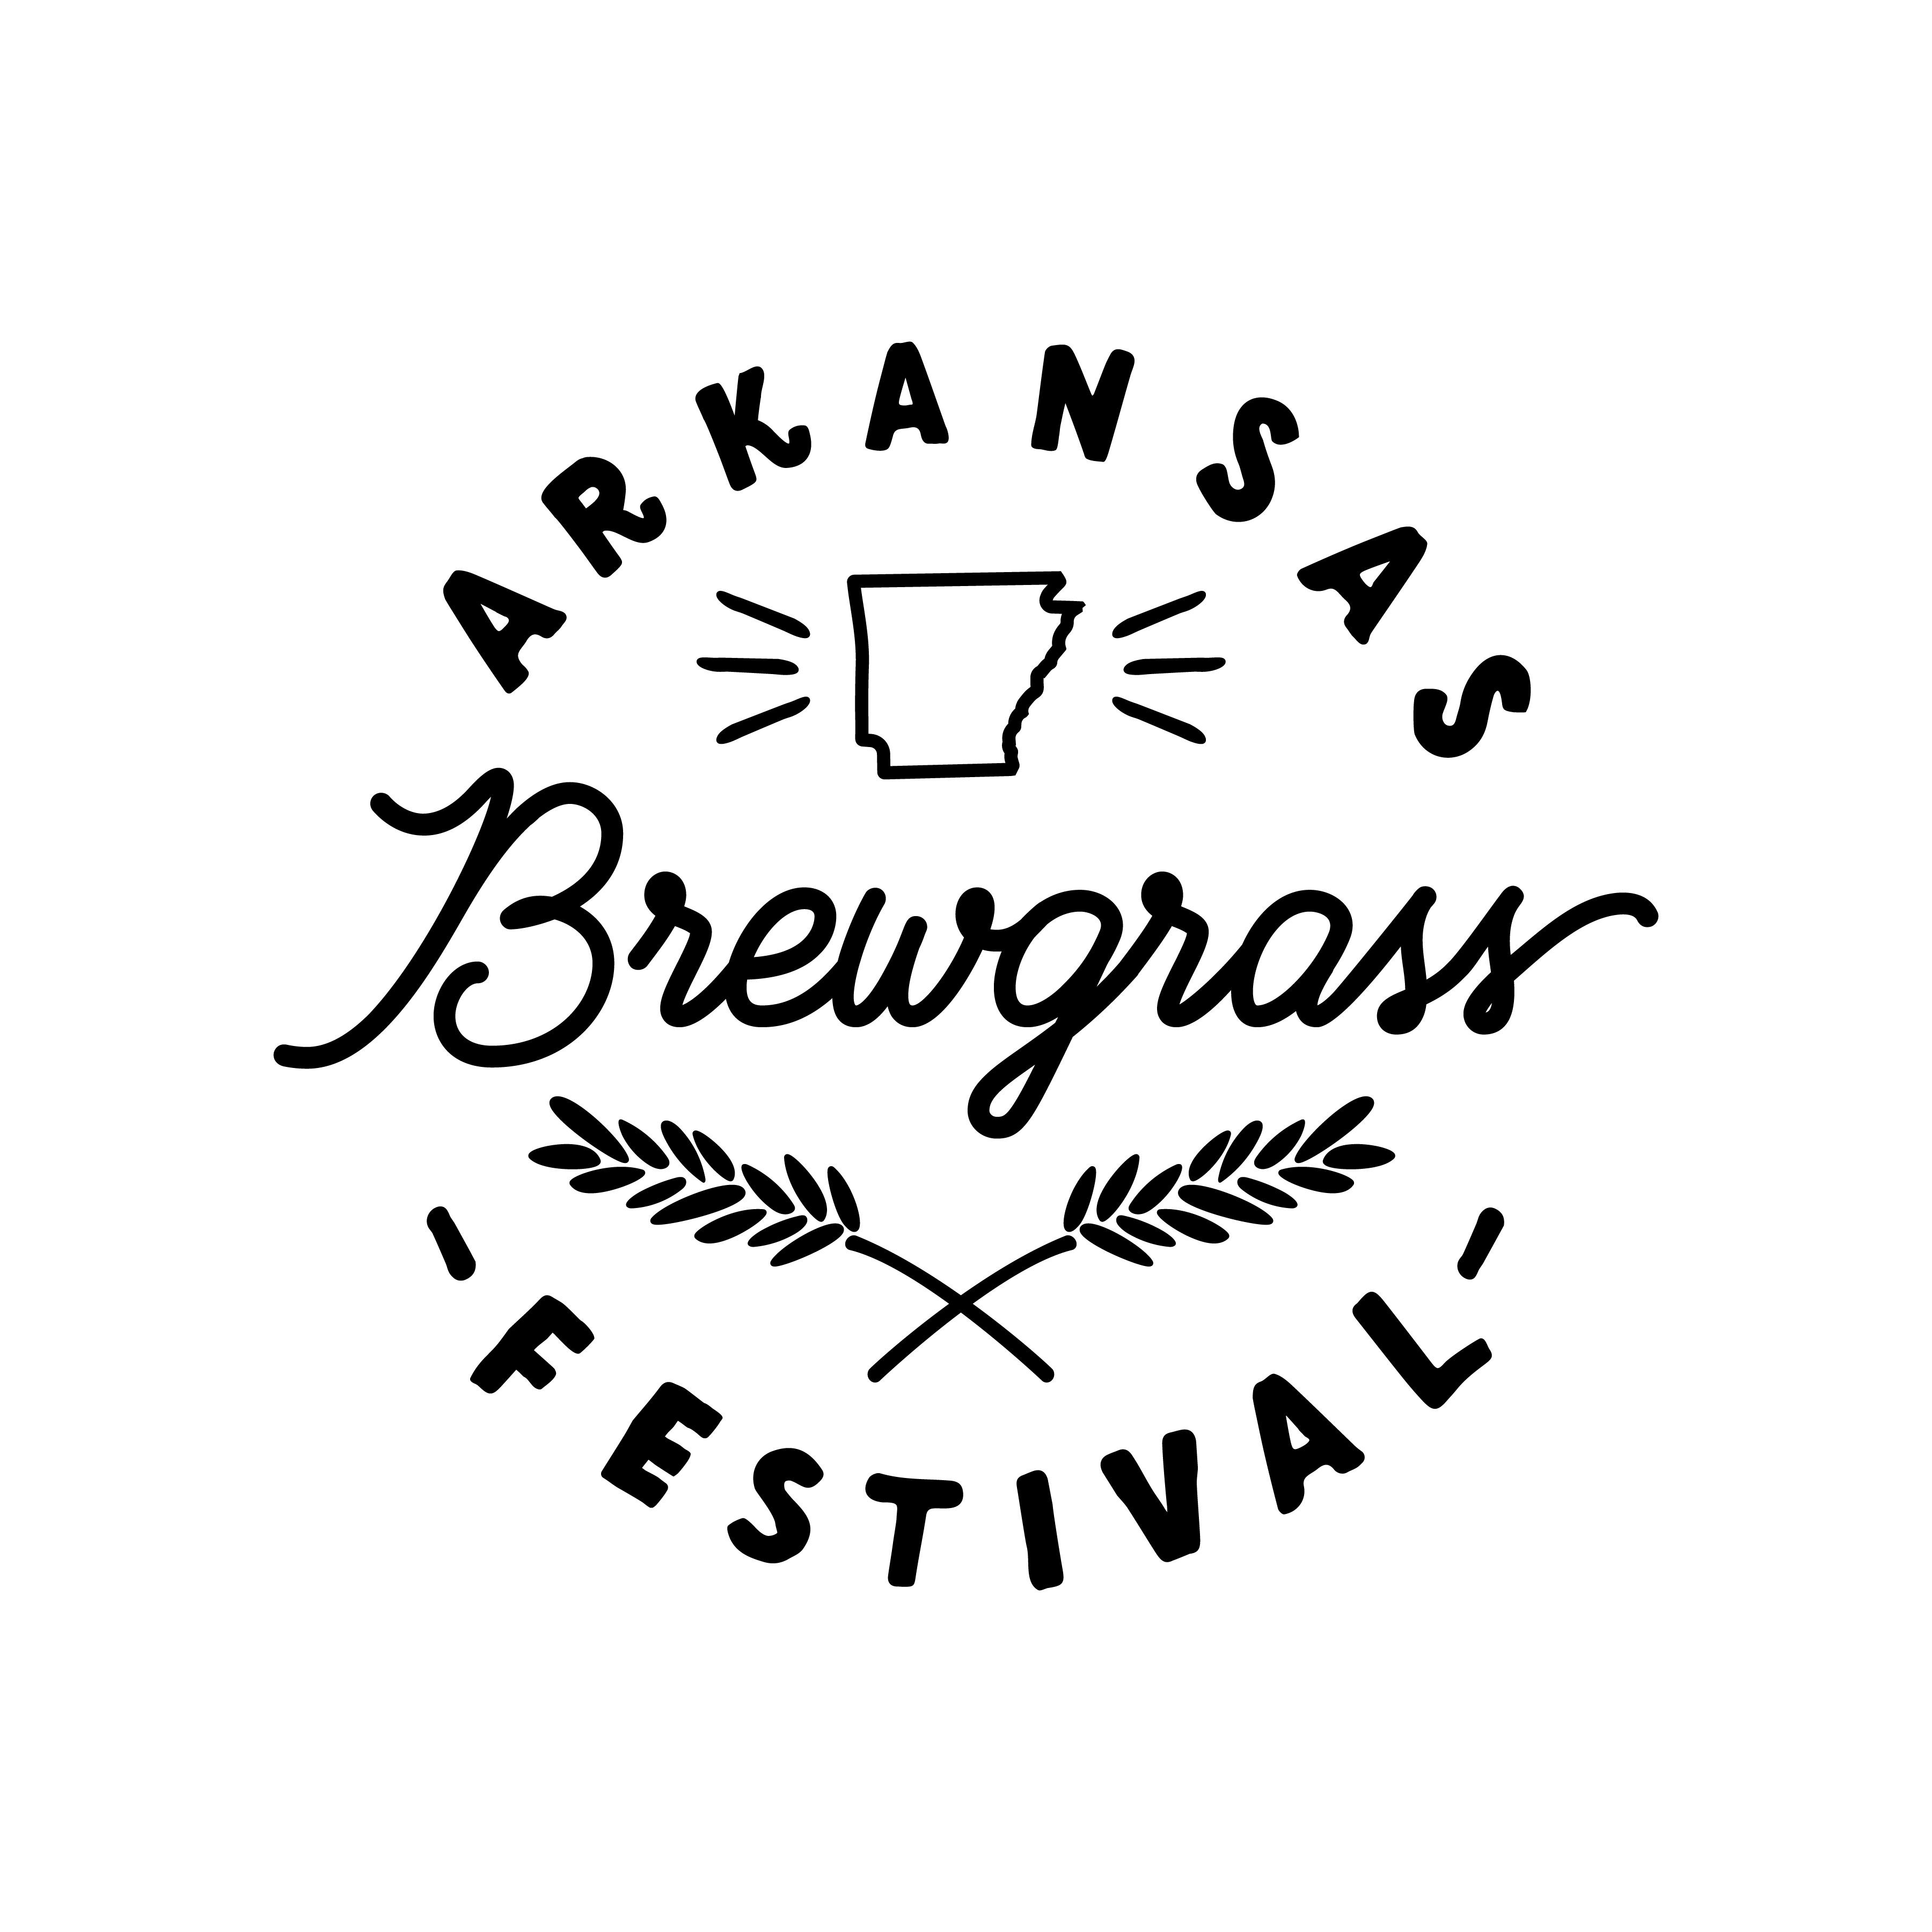 Arkansas Brewgrass Festival set for April 29